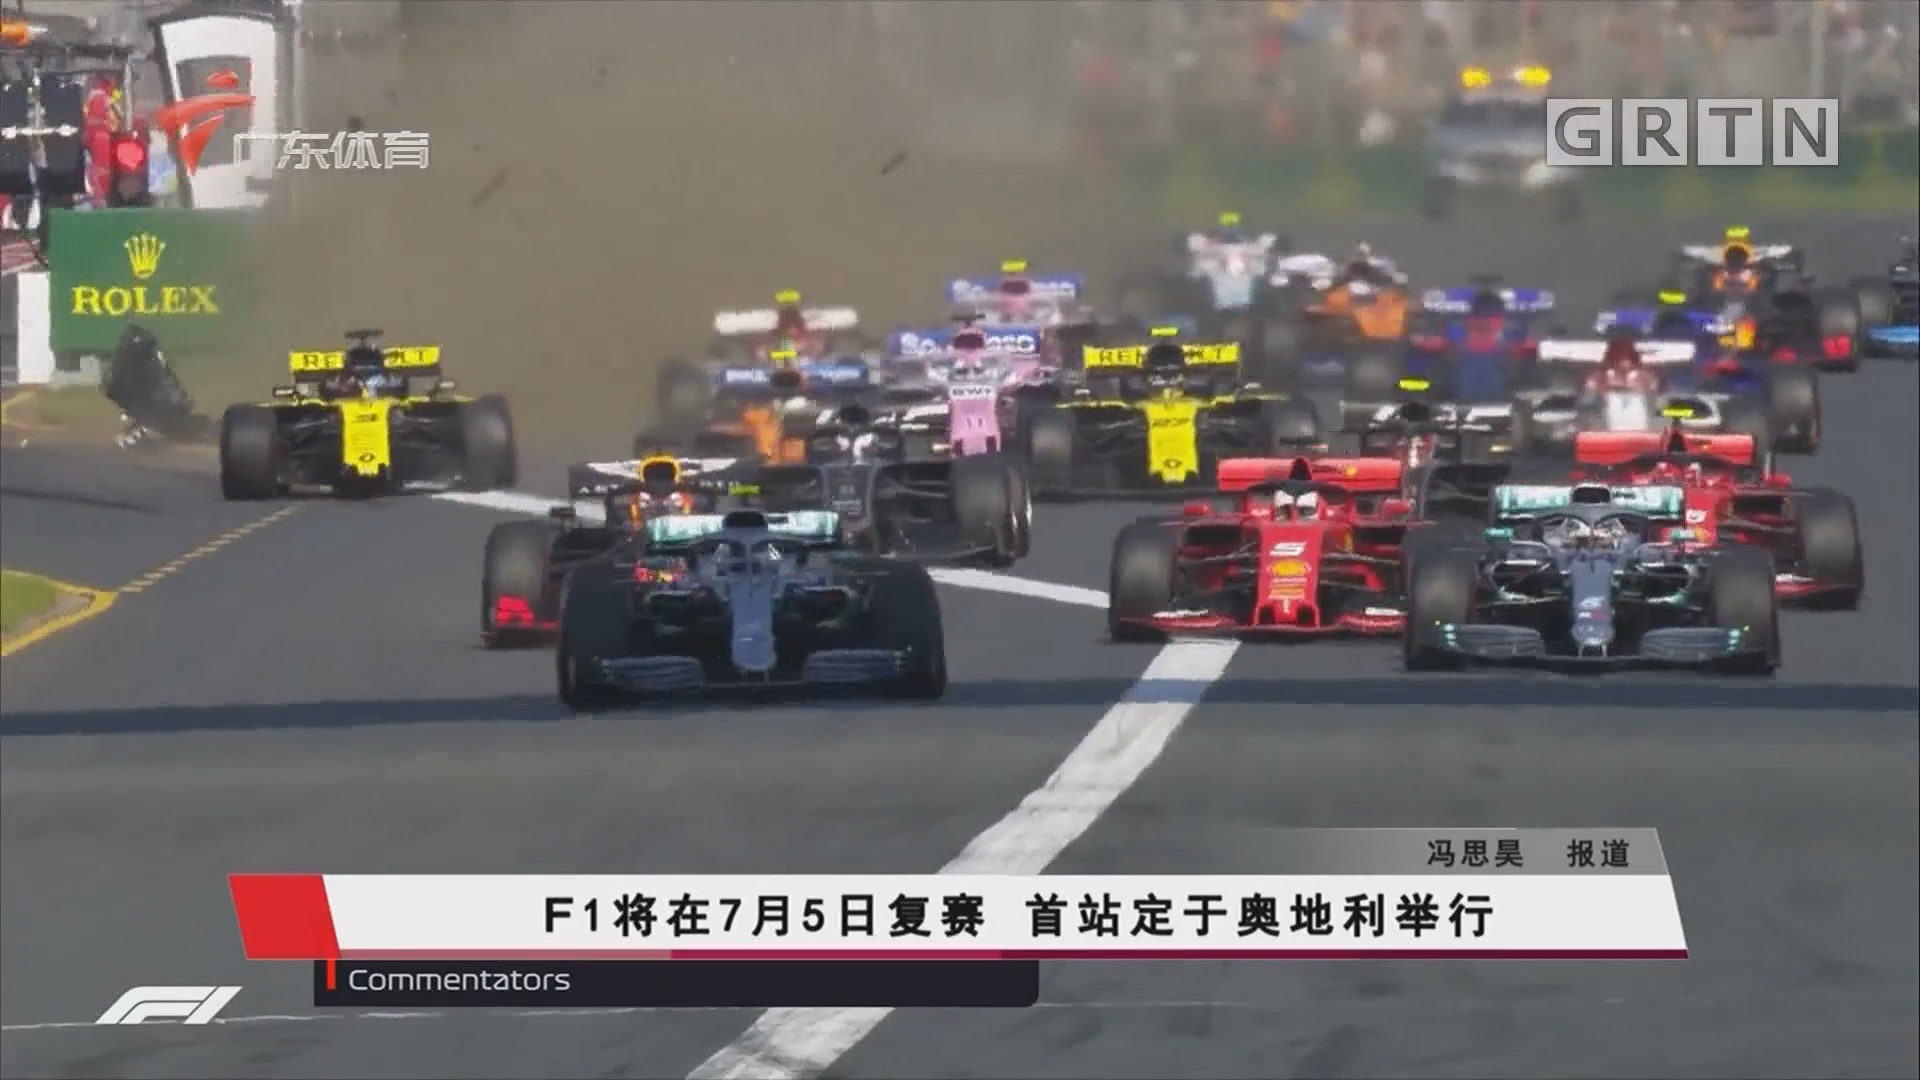 F1将在7月5日复赛 首站定于奥地利举行